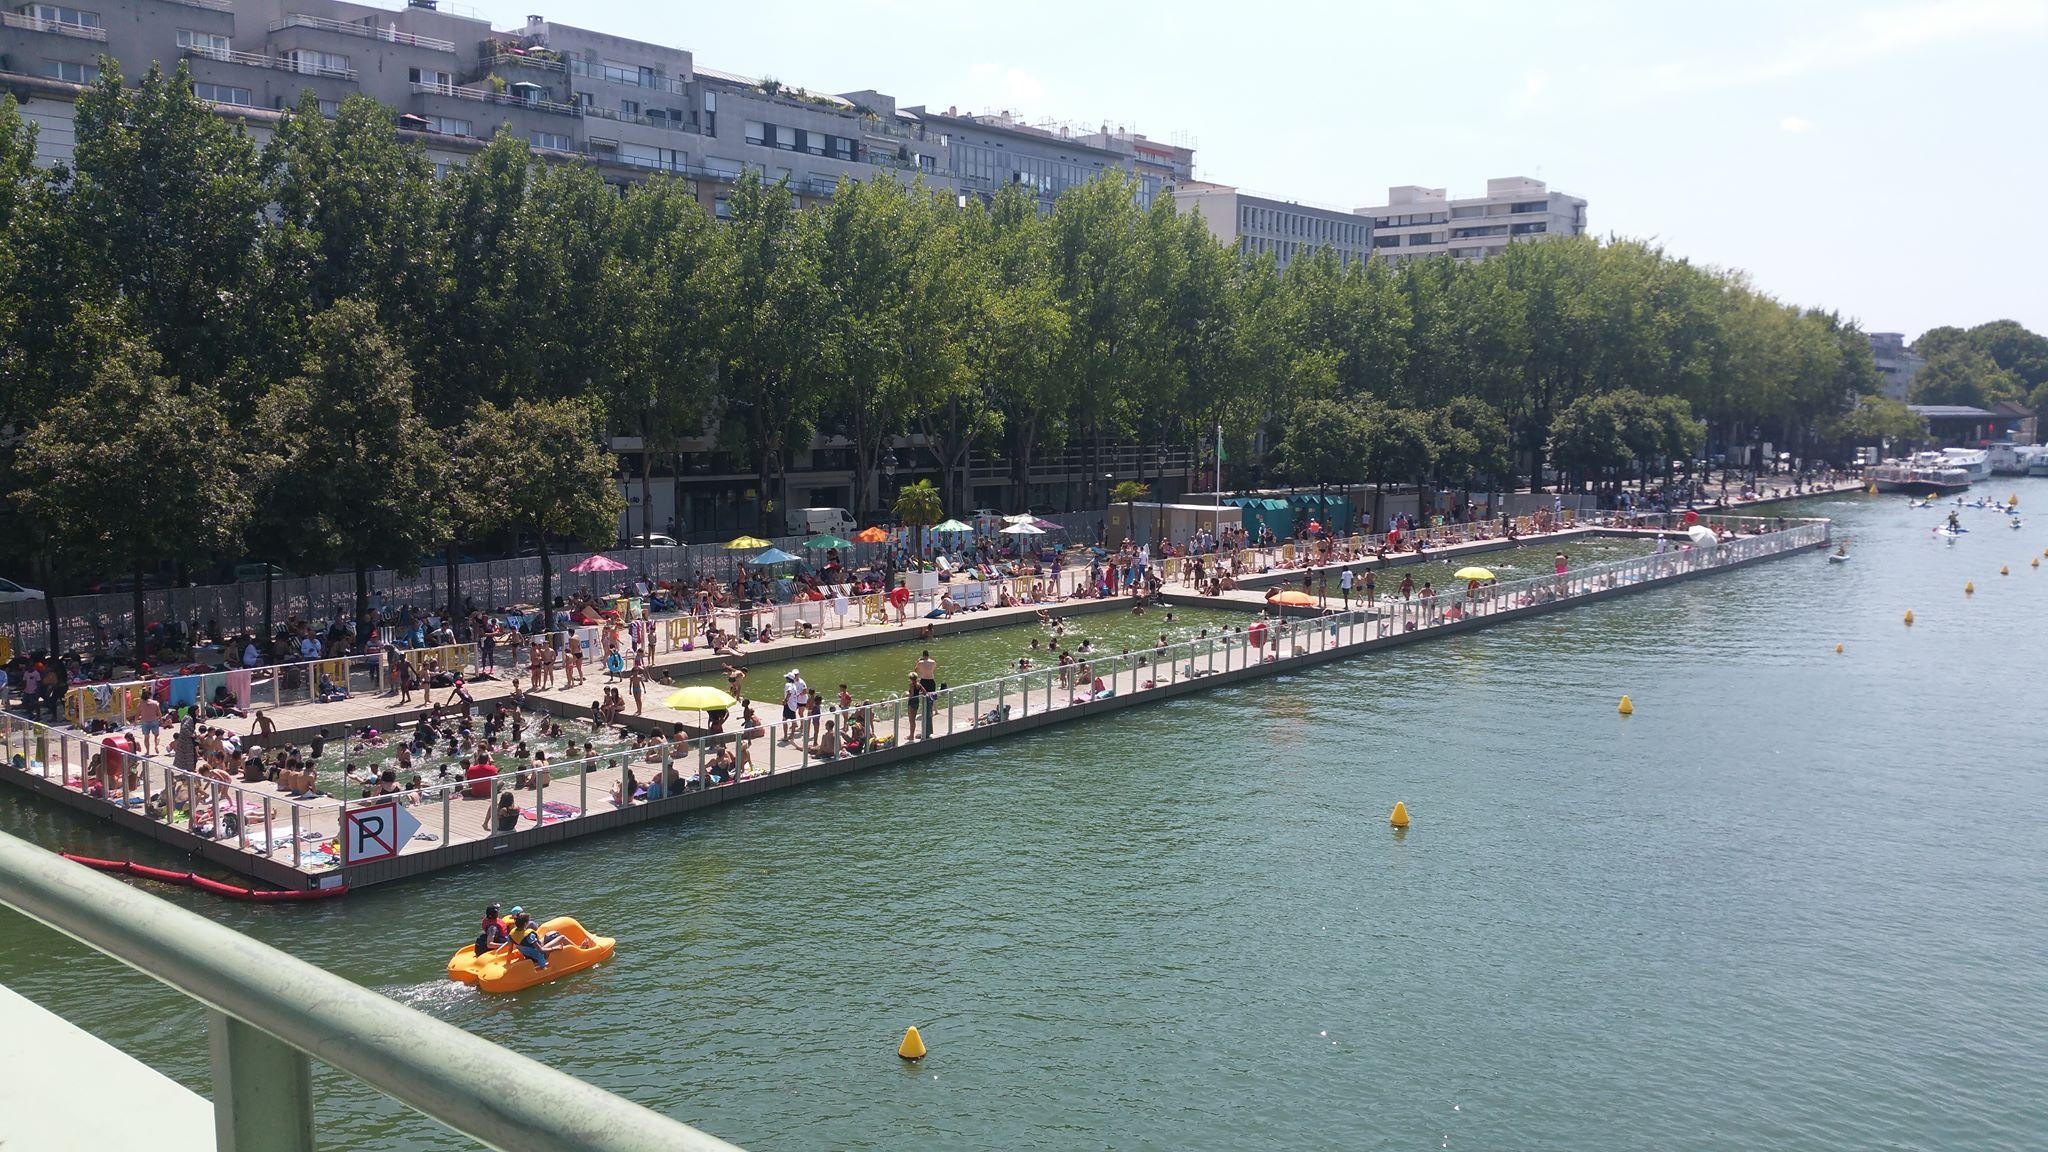 """La Baignade"", la piscine du bassin de la Villette, Paris"